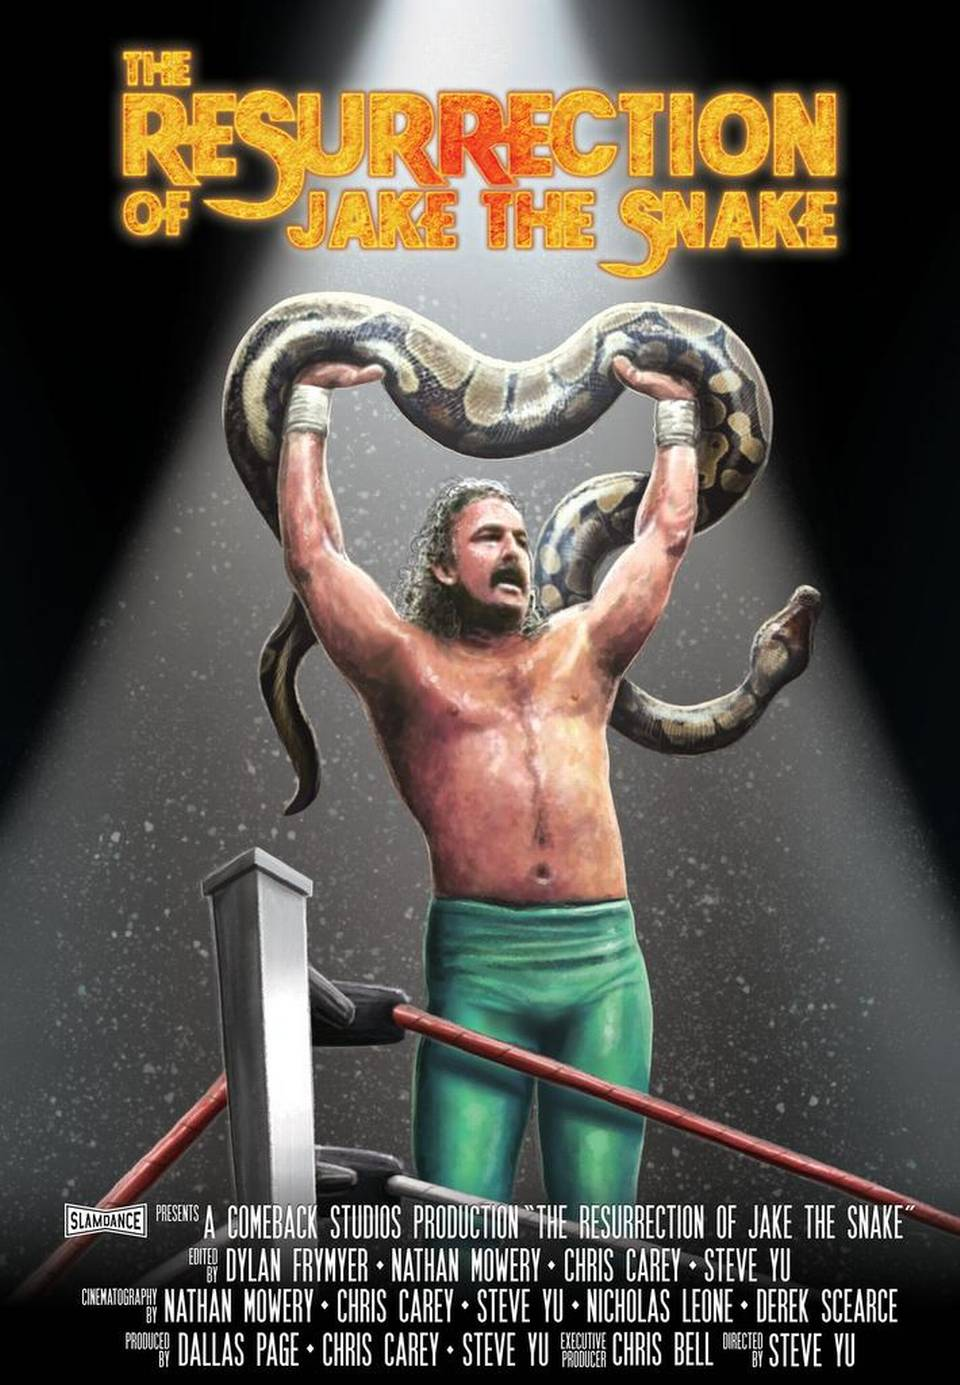 The Resurrection of Jake the Snake (2015)